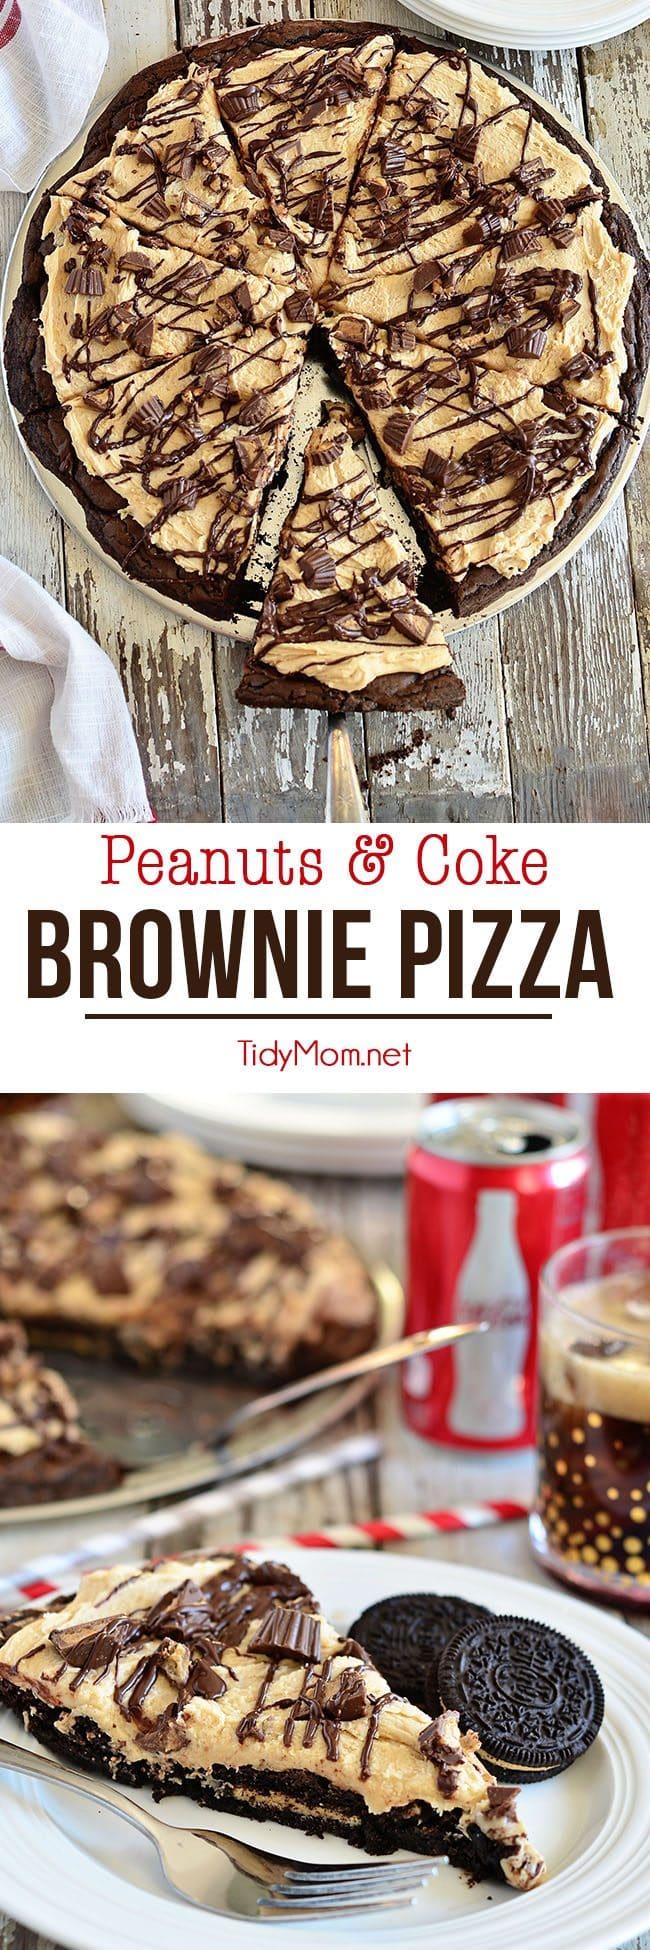 Peanuts in My Coke! Peanut & Coke Brownie Pizza recipe at Tidymom.net